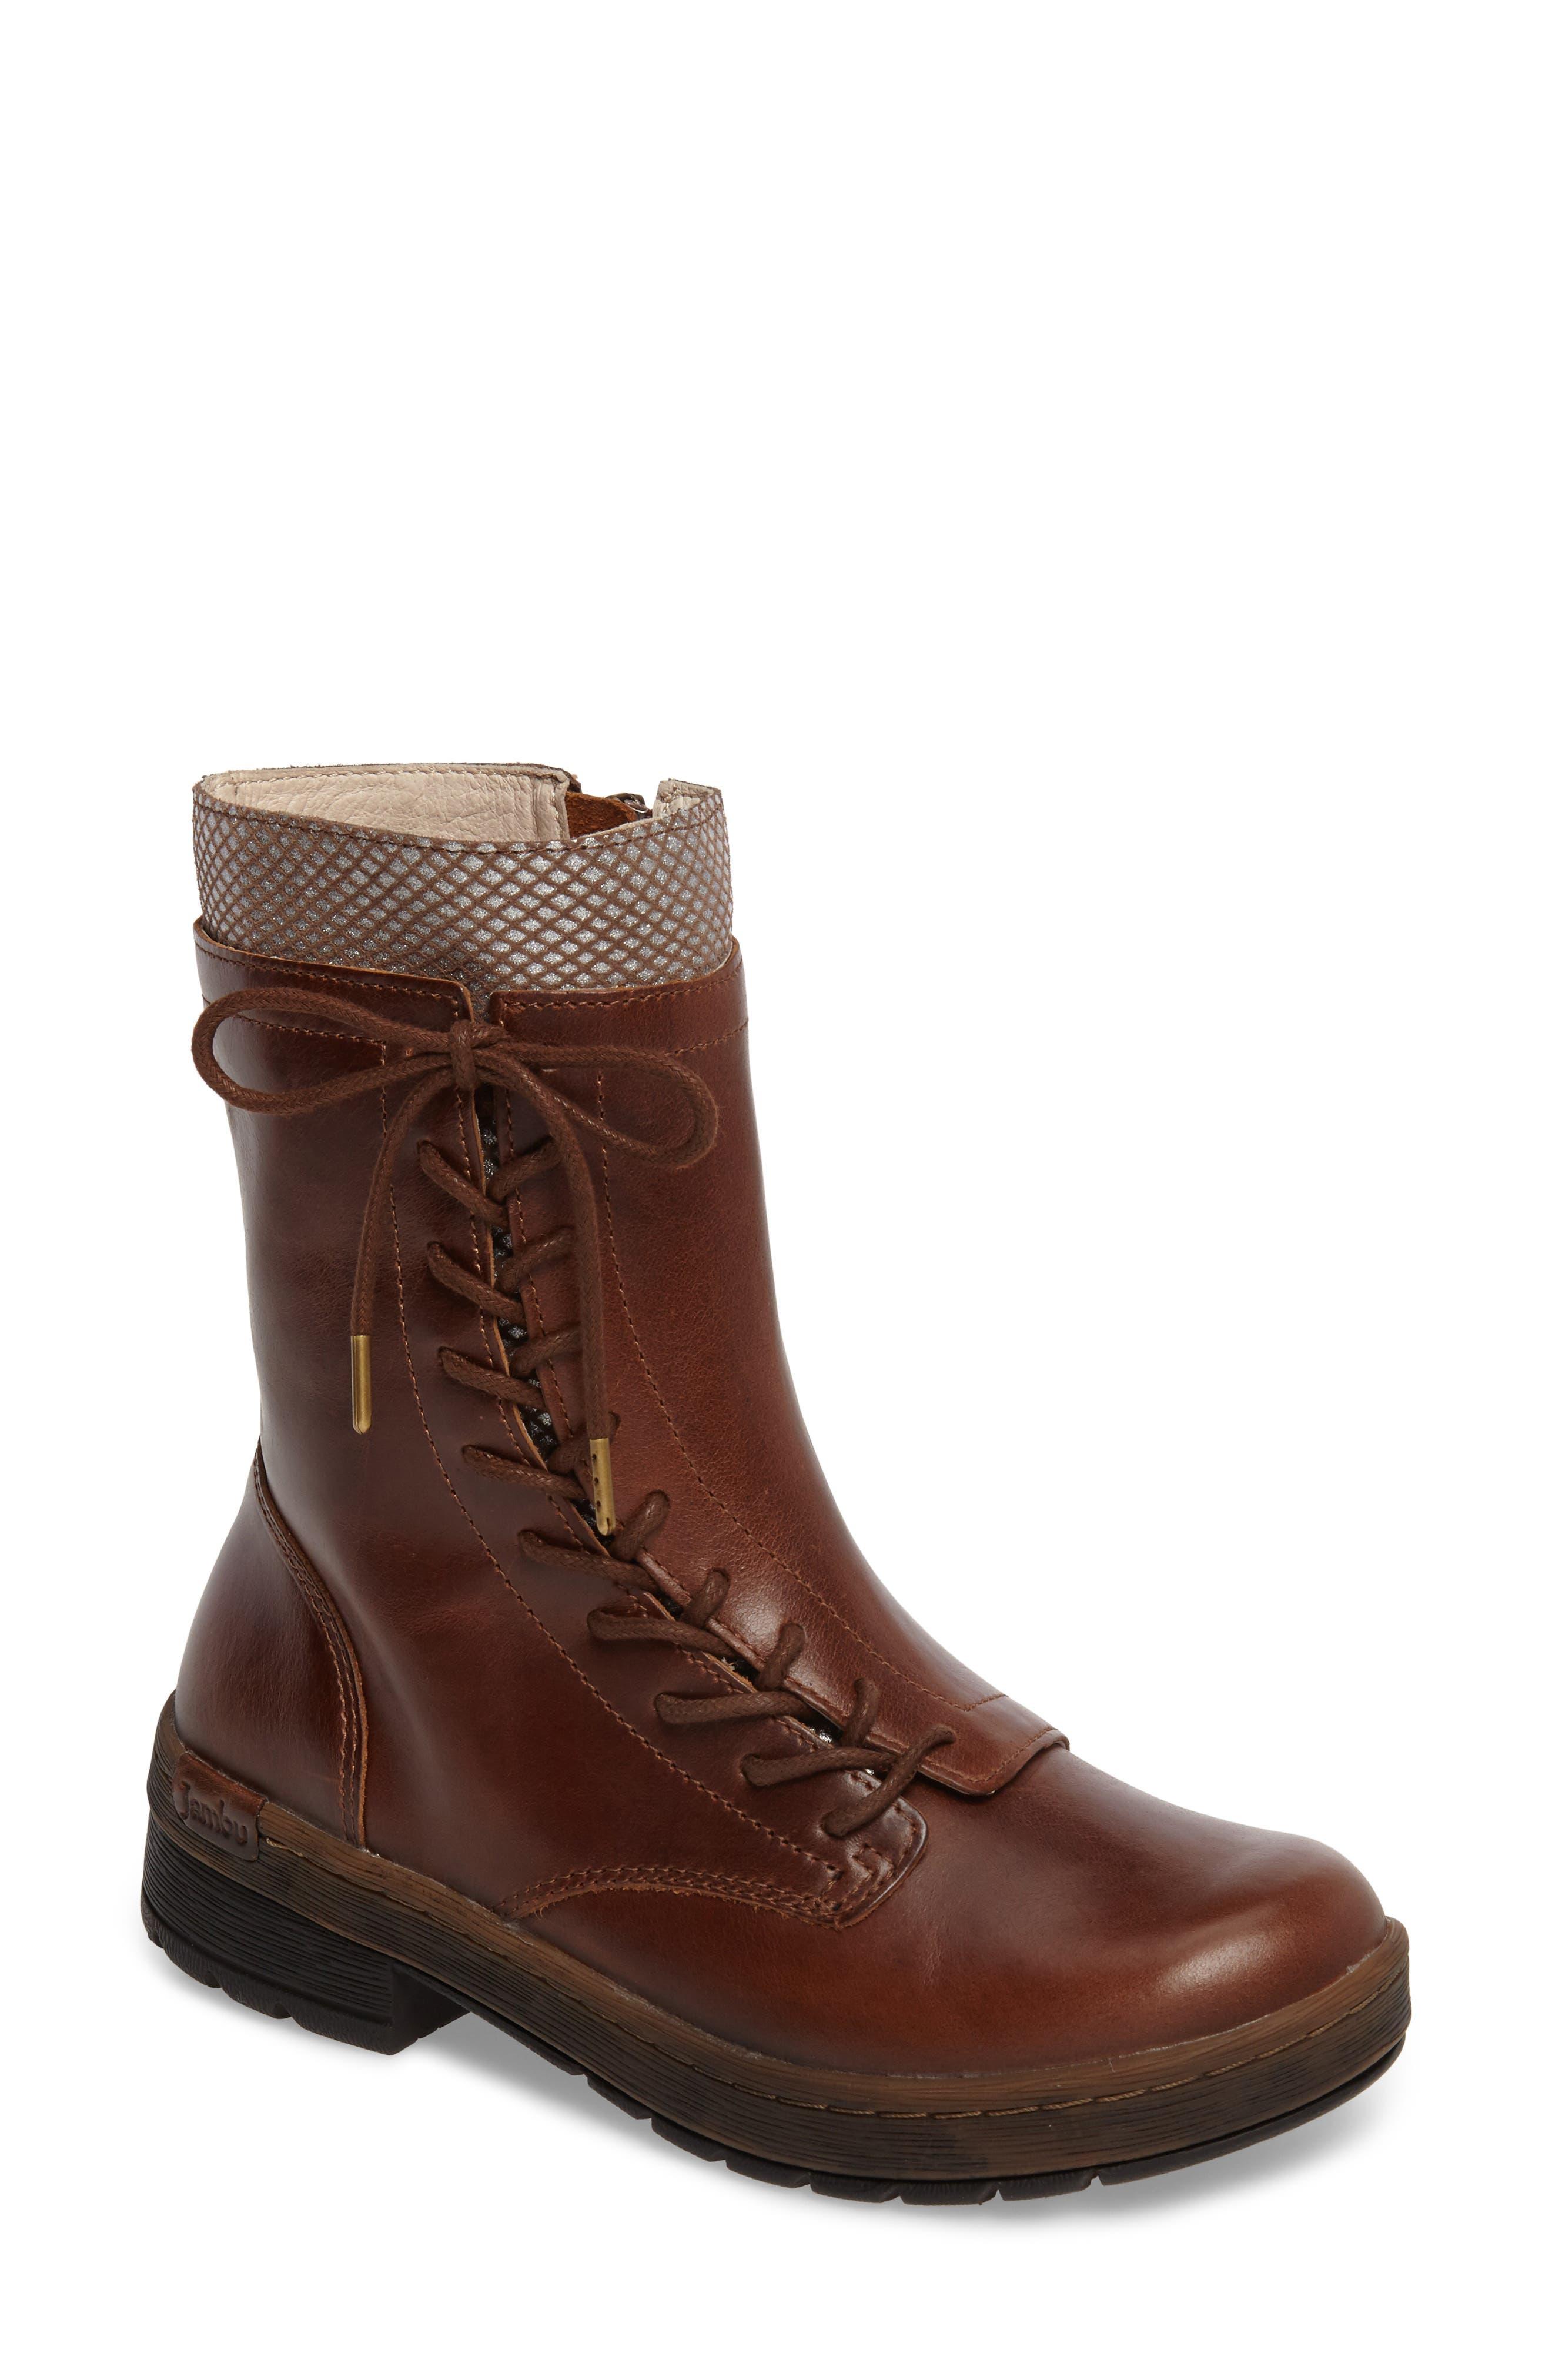 Jambu Chestnut Lace-Up Water Resistant Boot (Women)